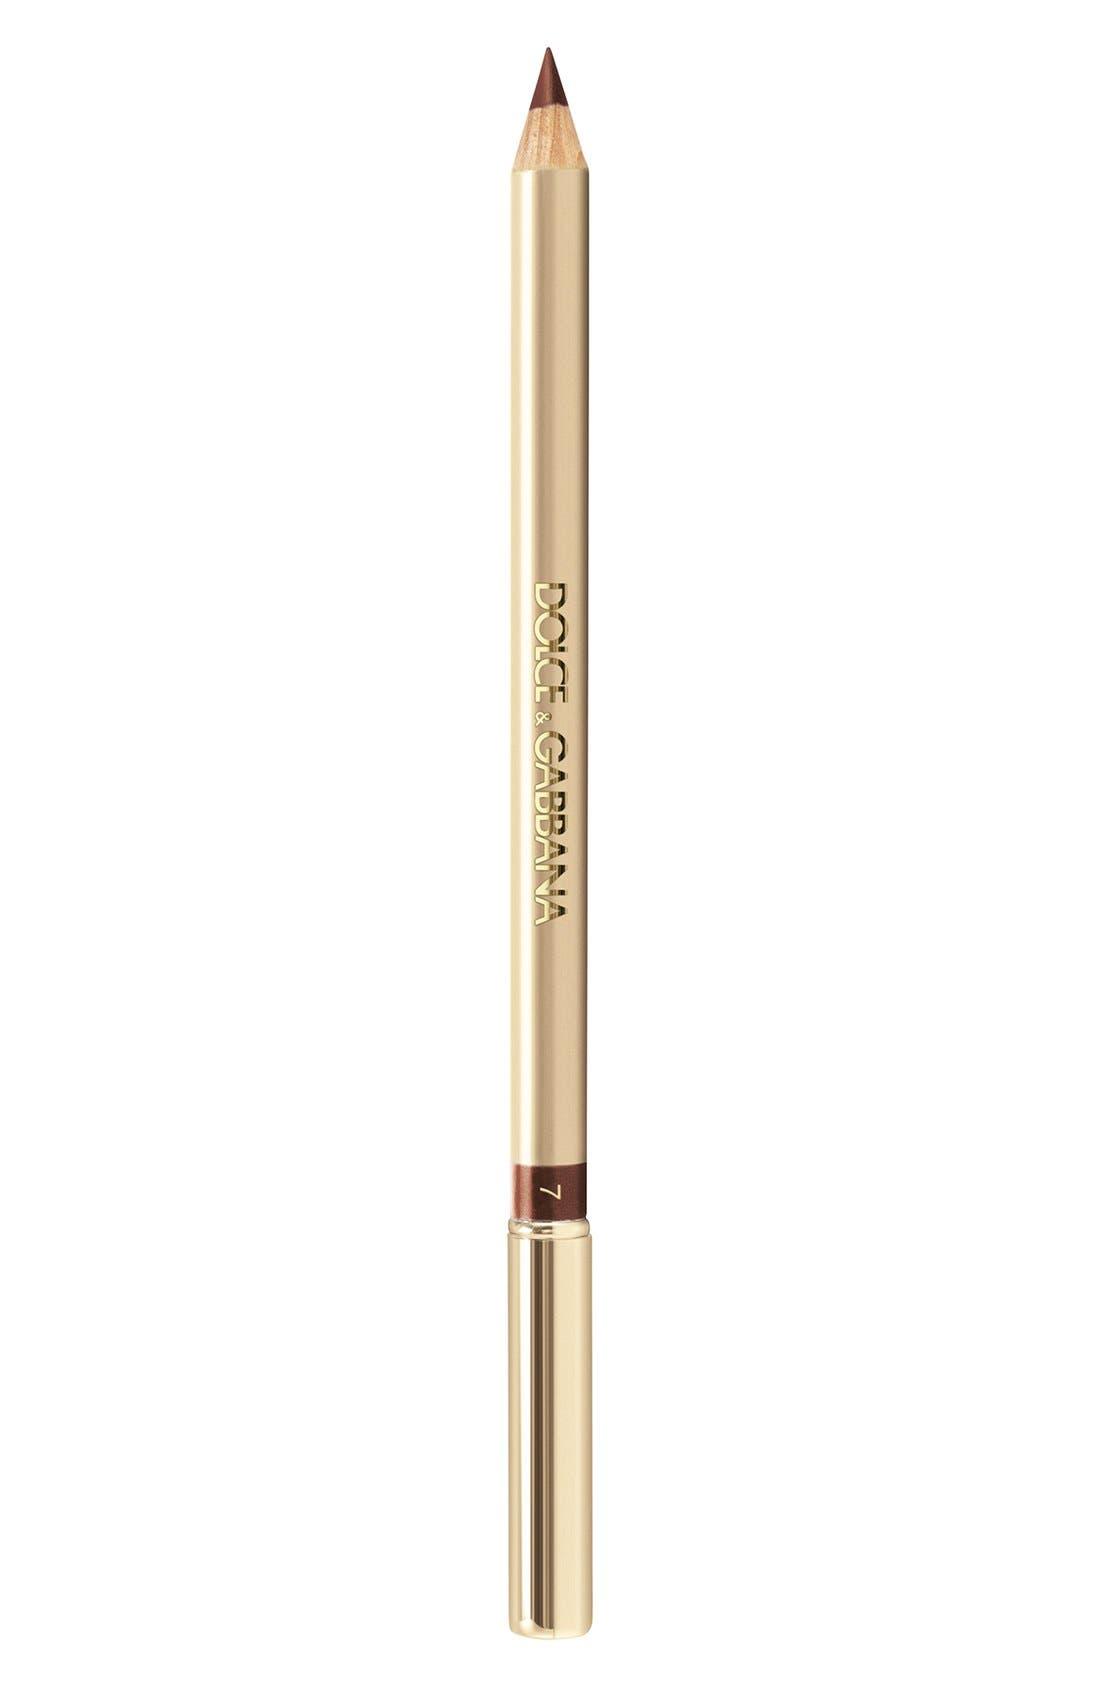 Dolce&Gabbana Beauty Precision Lip Liner